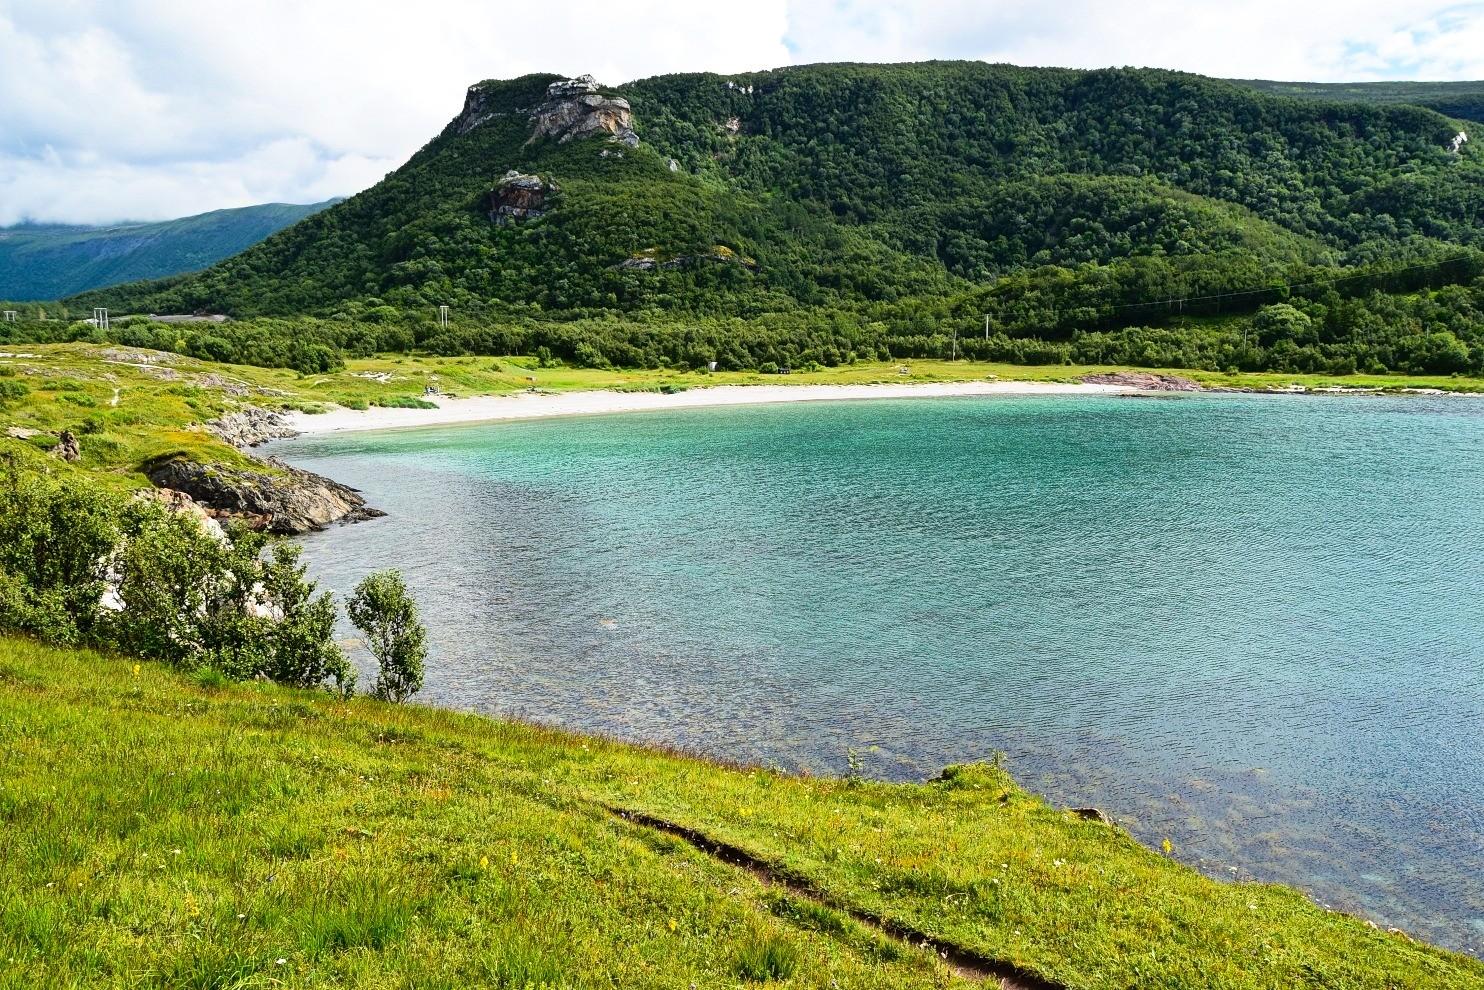 Ausvika utenfor Bodø